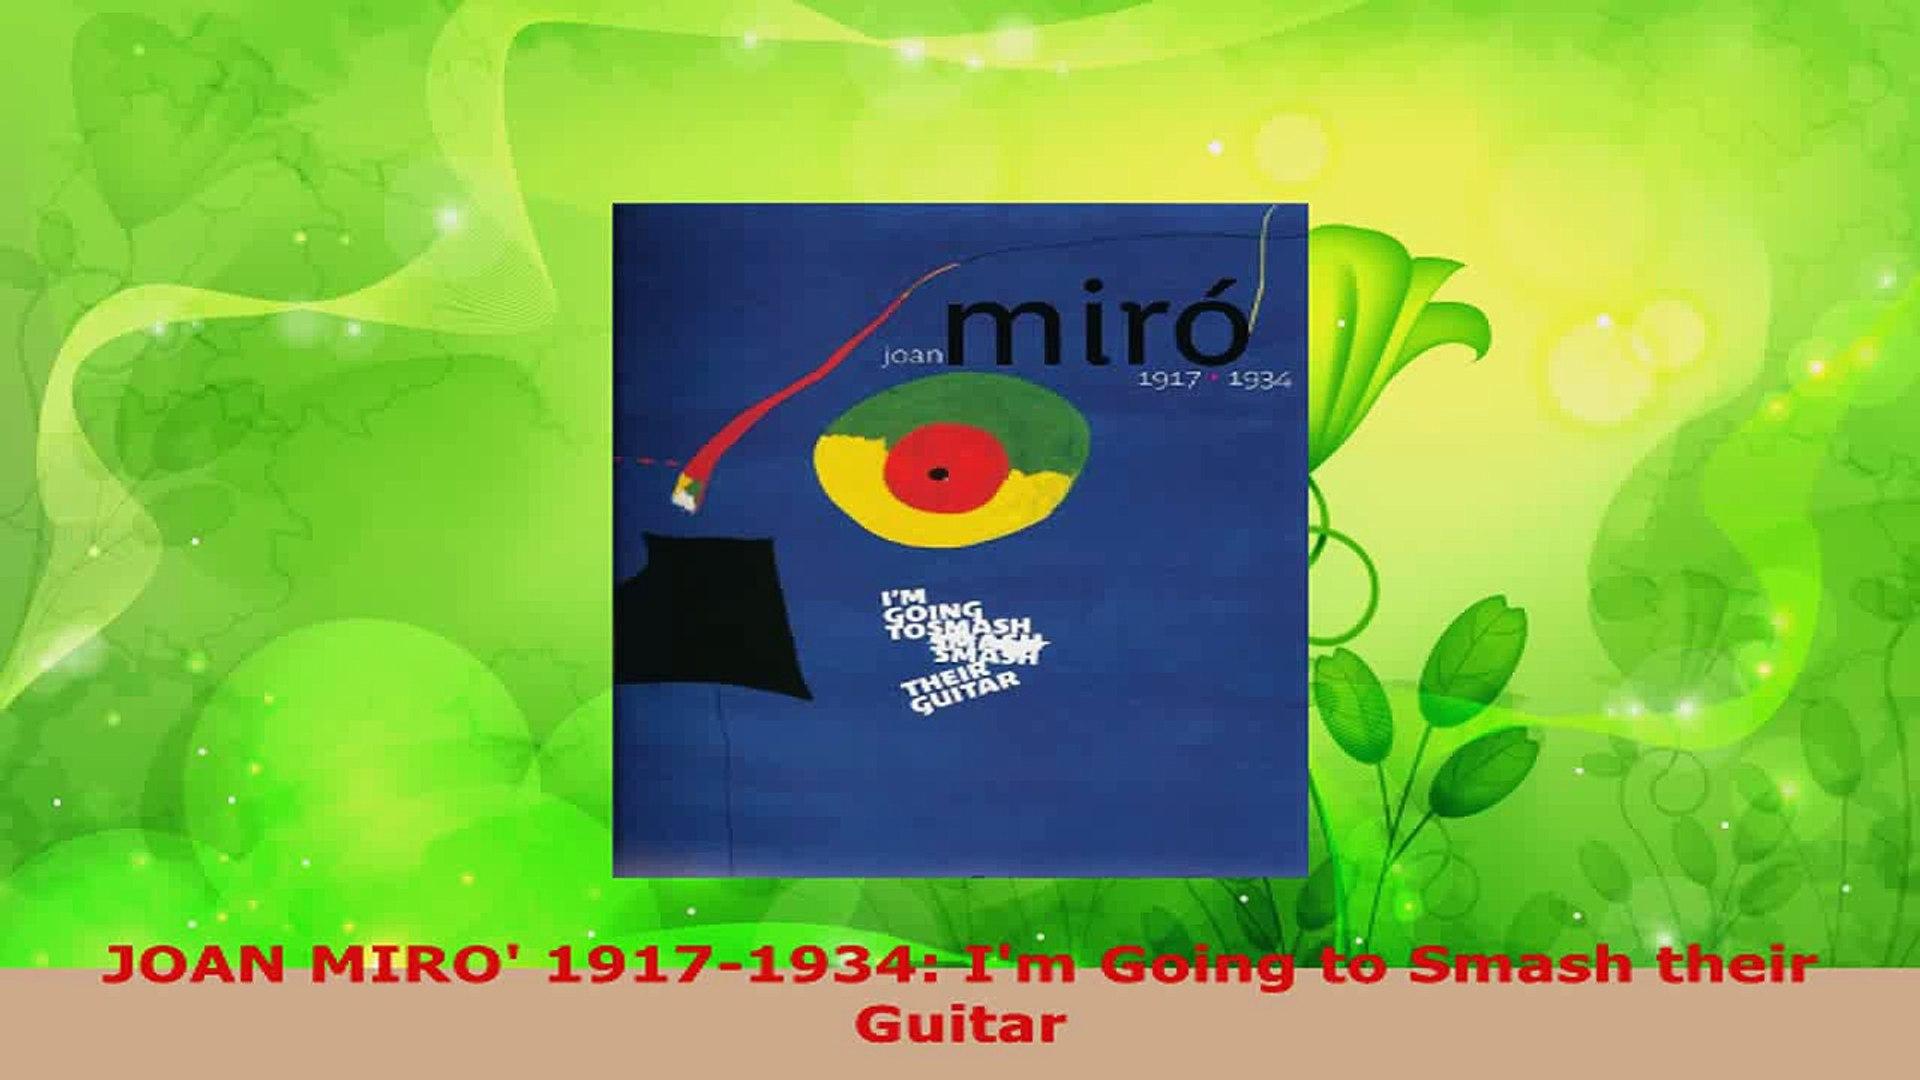 Joan Miro 1917-1934